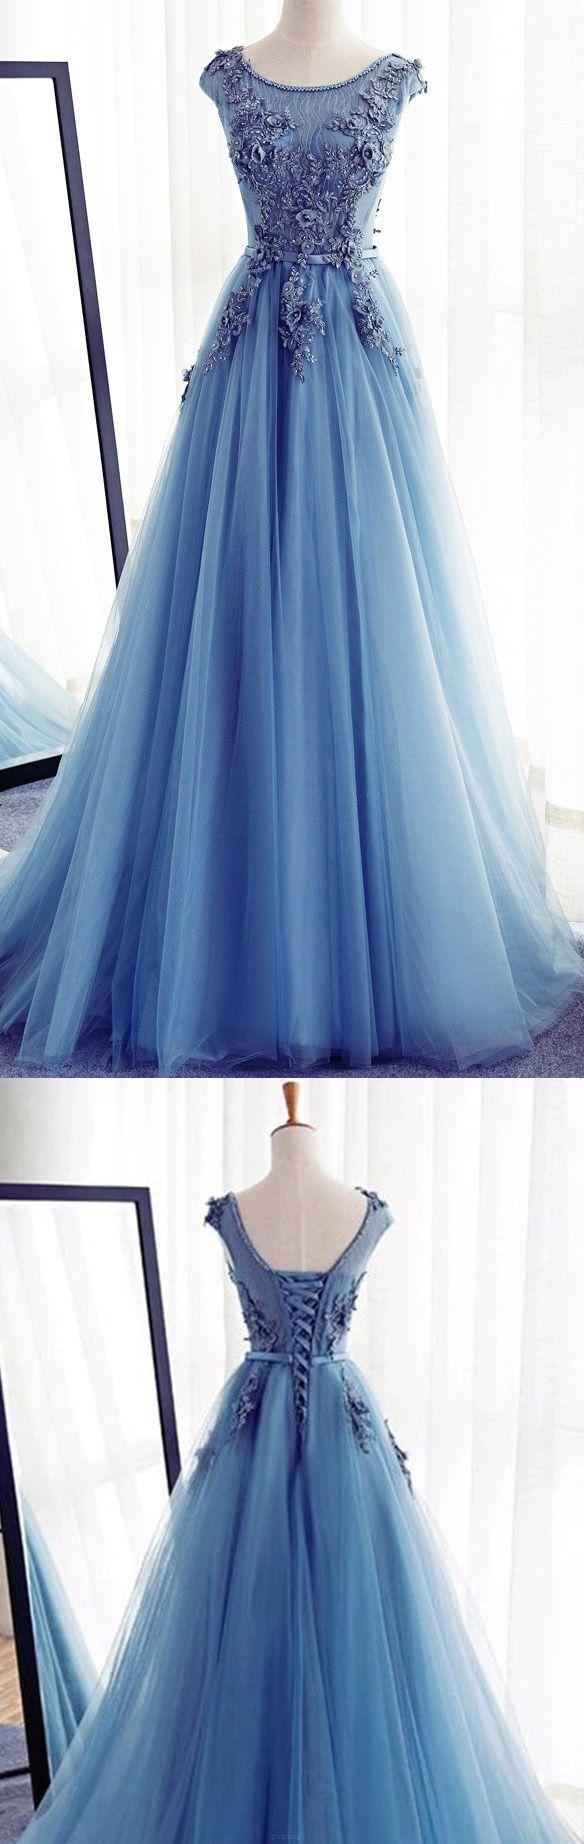 Elegant, blue gown. Prom dress.